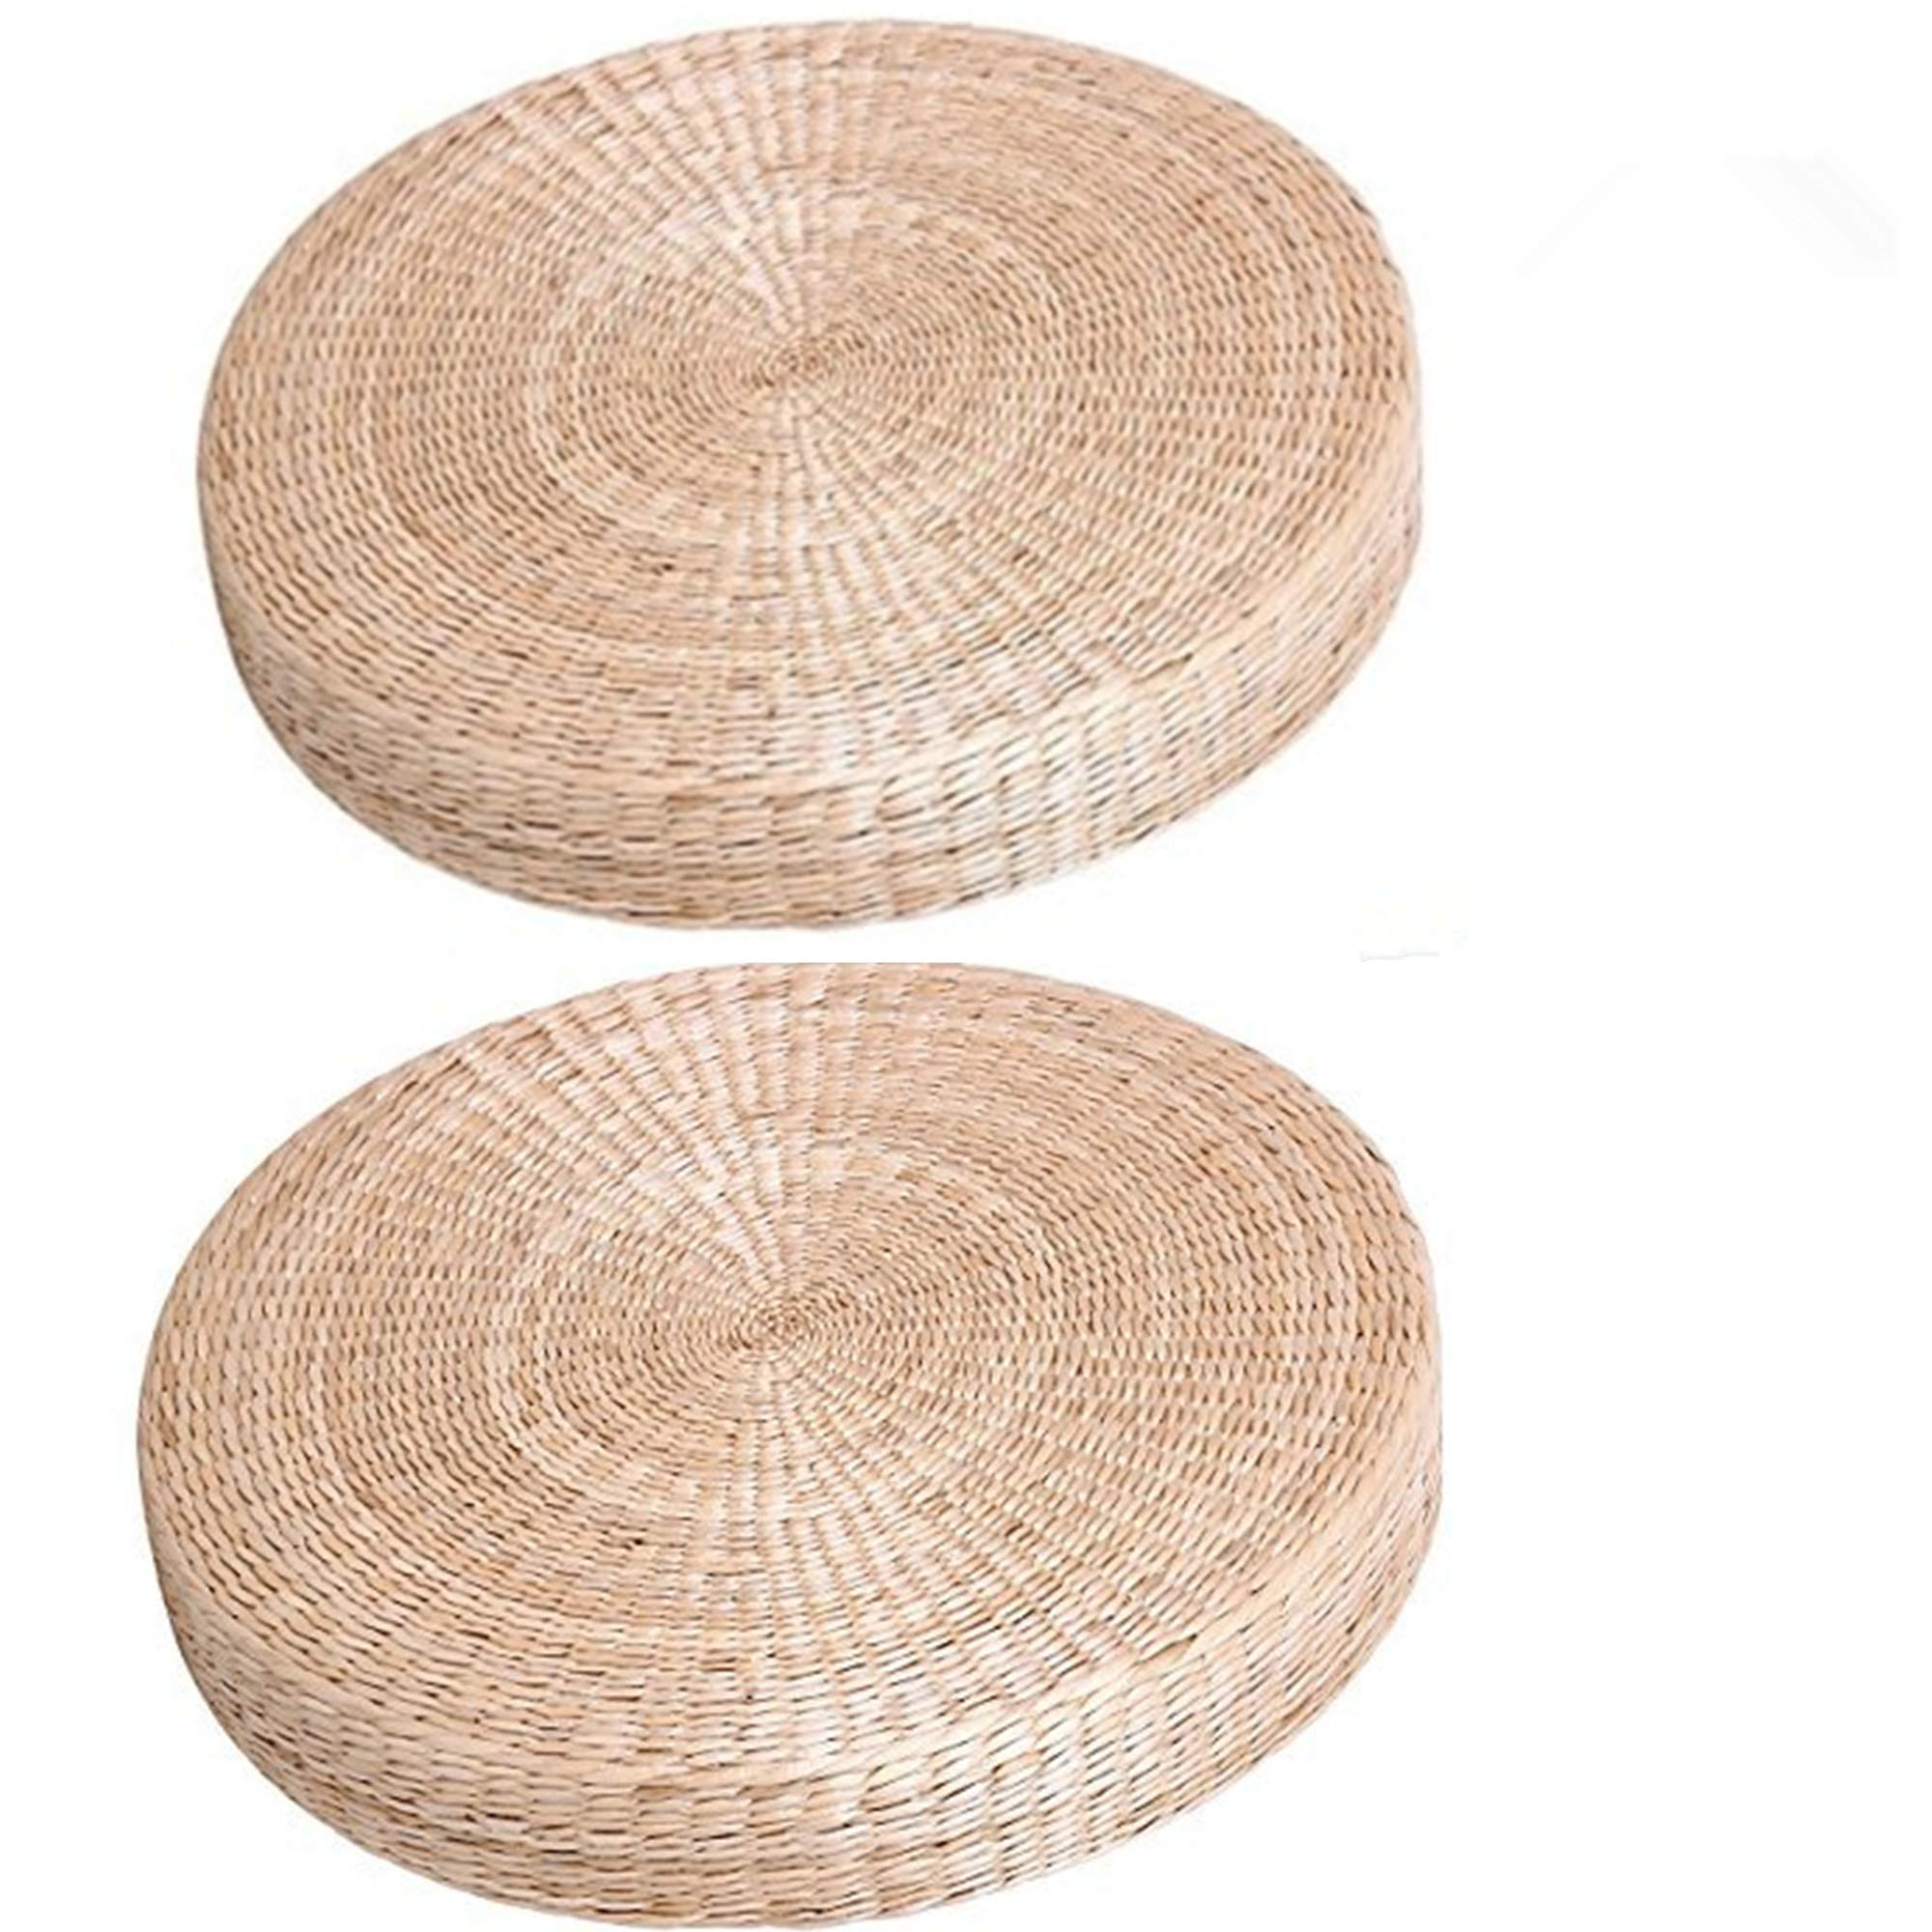 HUAWELL 2 Piece Japanese Tradtional Tatami Floor Pillow Floor Mat Cushion Yoga mat Multi-Functional Handmade Eco-Friendly Breathable Circle Super Big Size (606010cm (23.63.94 Inch))